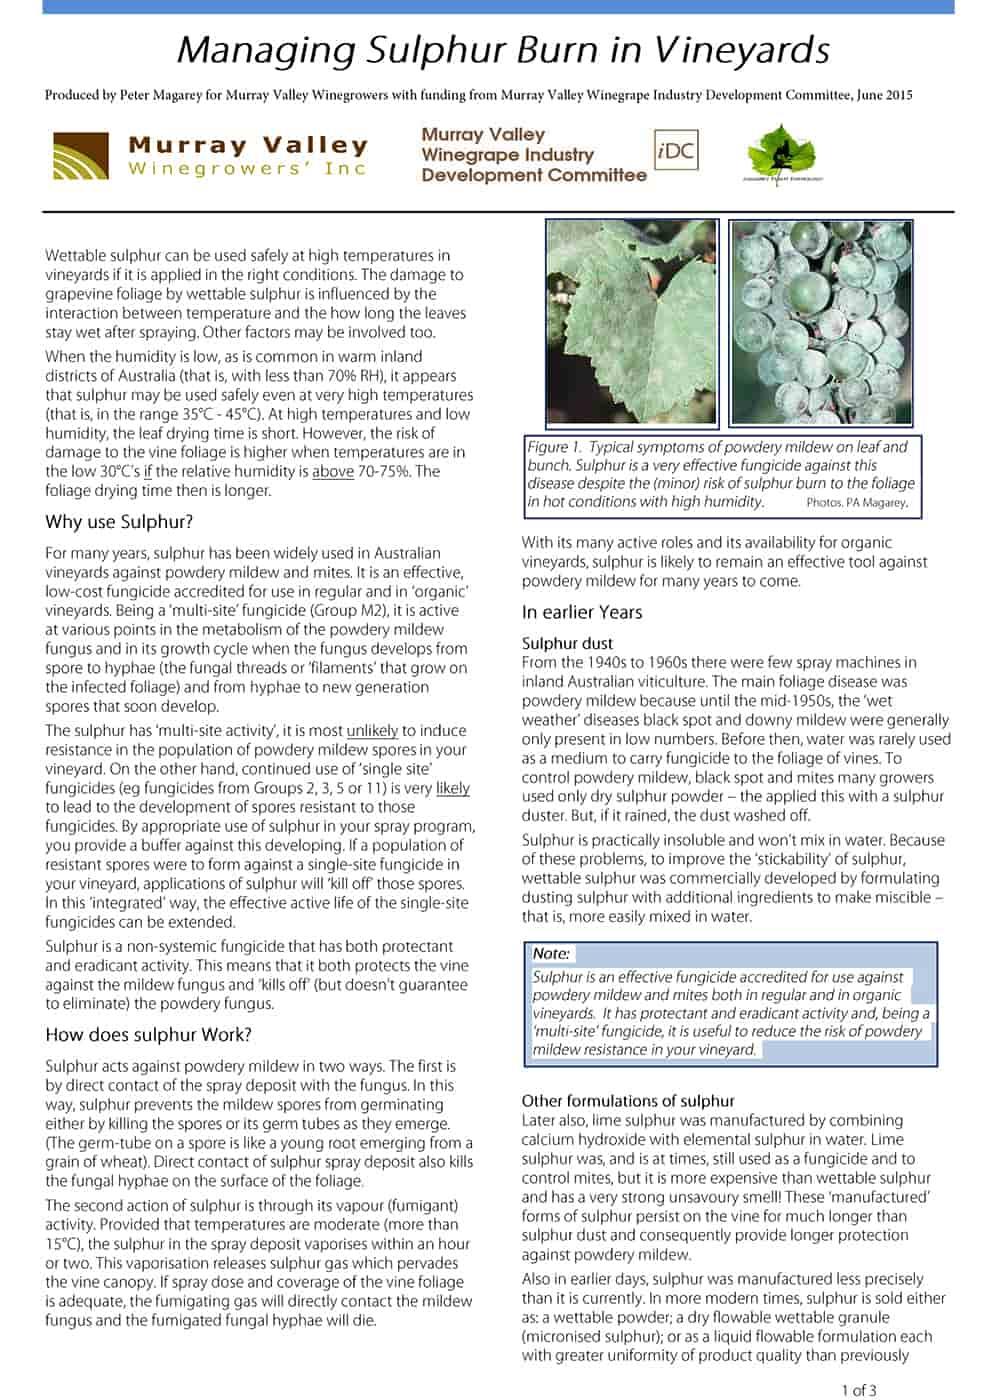 Managing Sulphur Burn in Vineyards